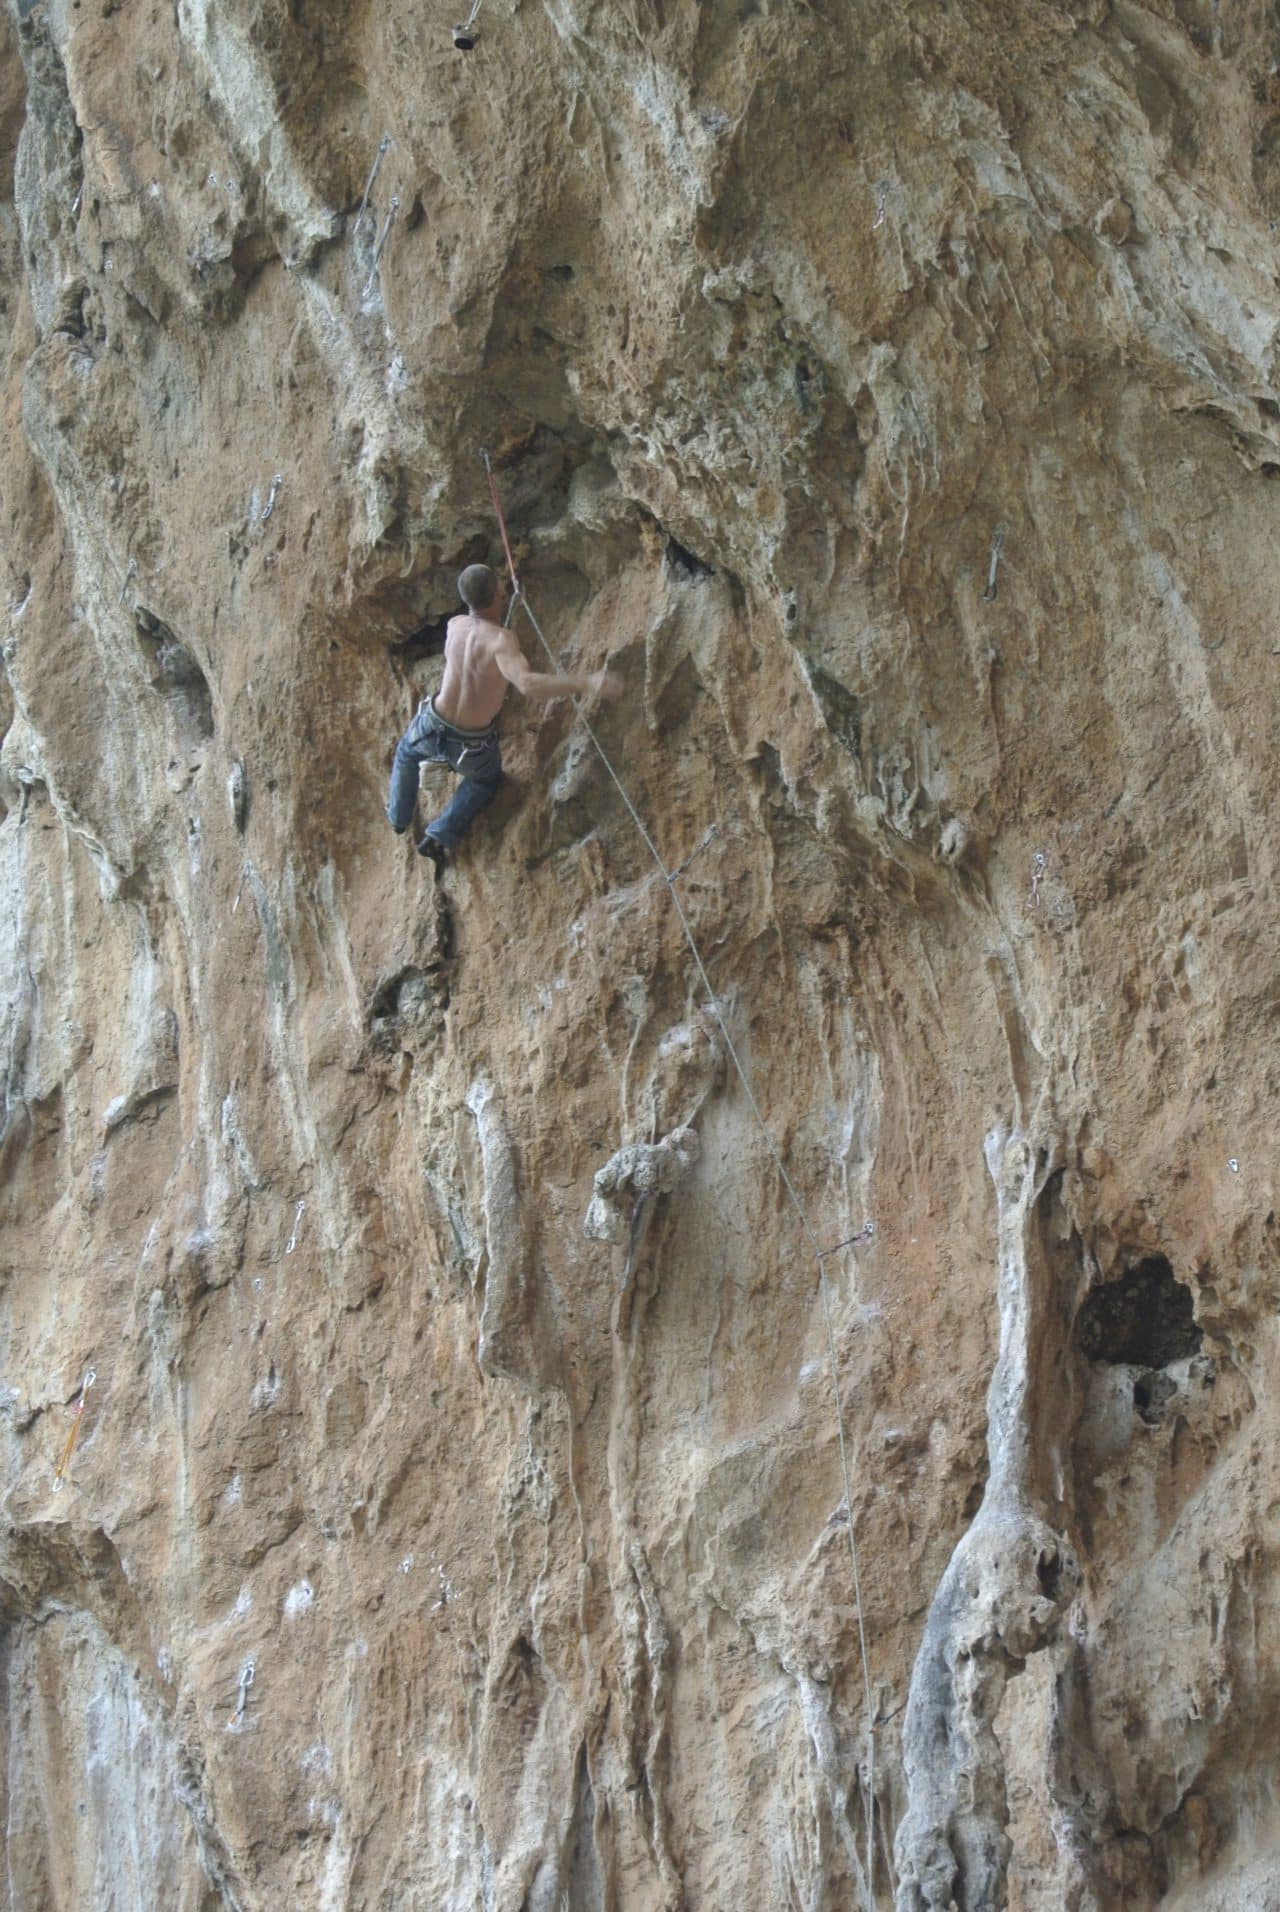 escalade-grece-athenes-xavier-carrard-guides-de-montagne-helyum-club-des-six-grotte